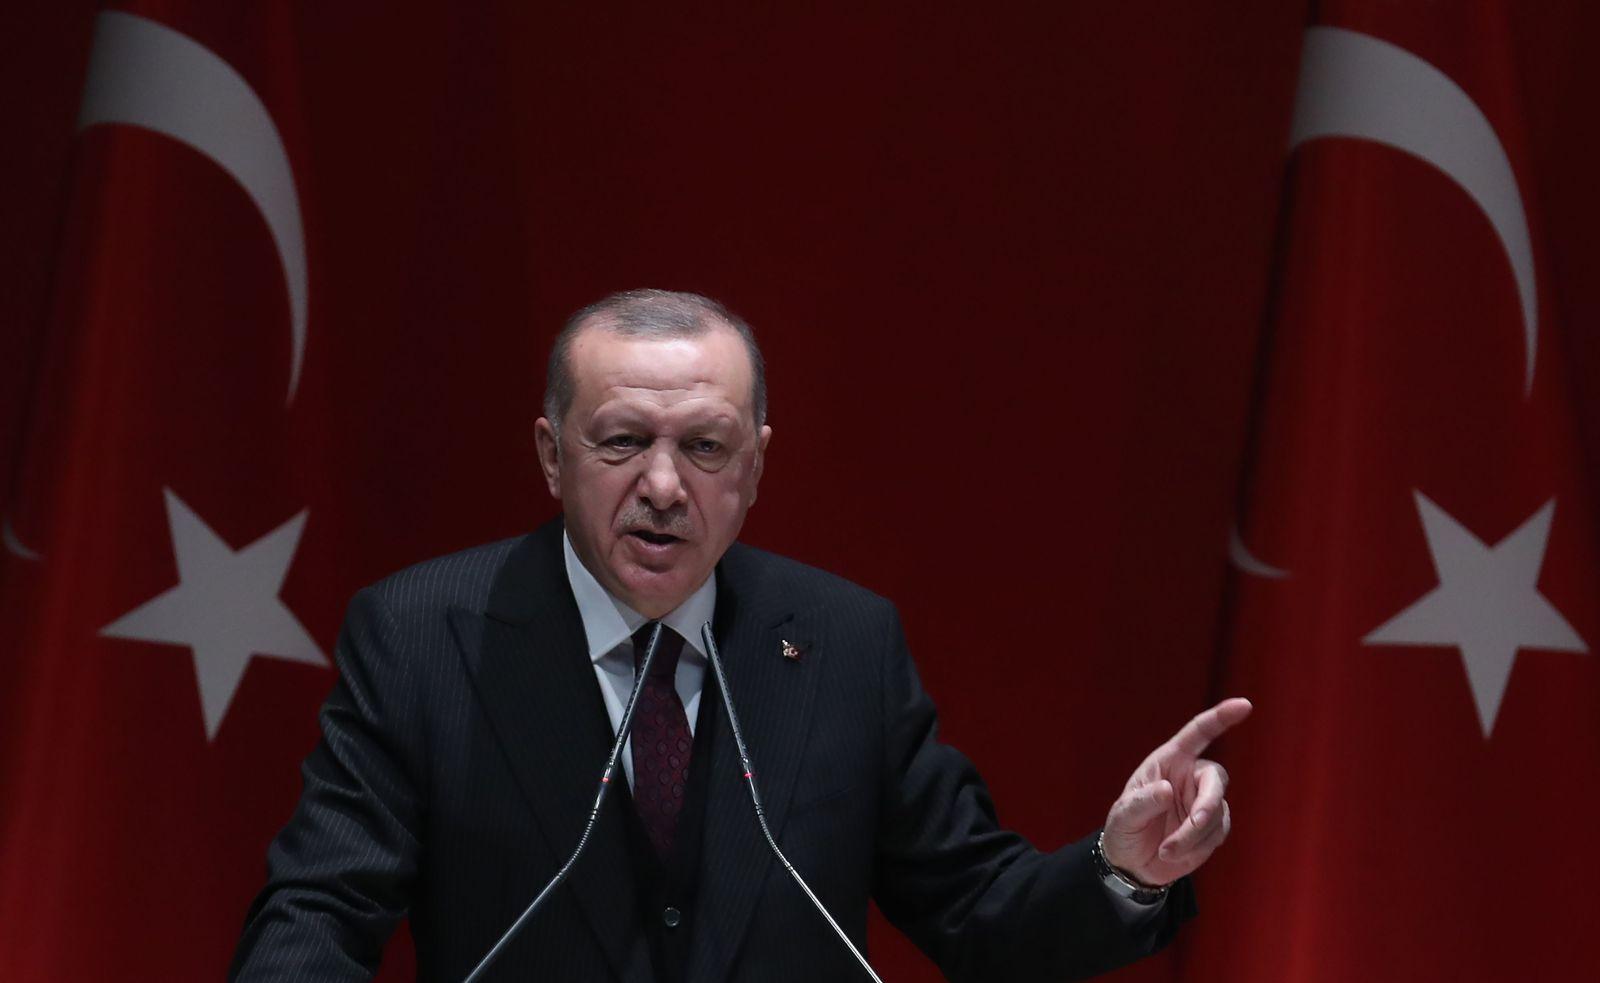 TURKEY-POLITCS-PARTY